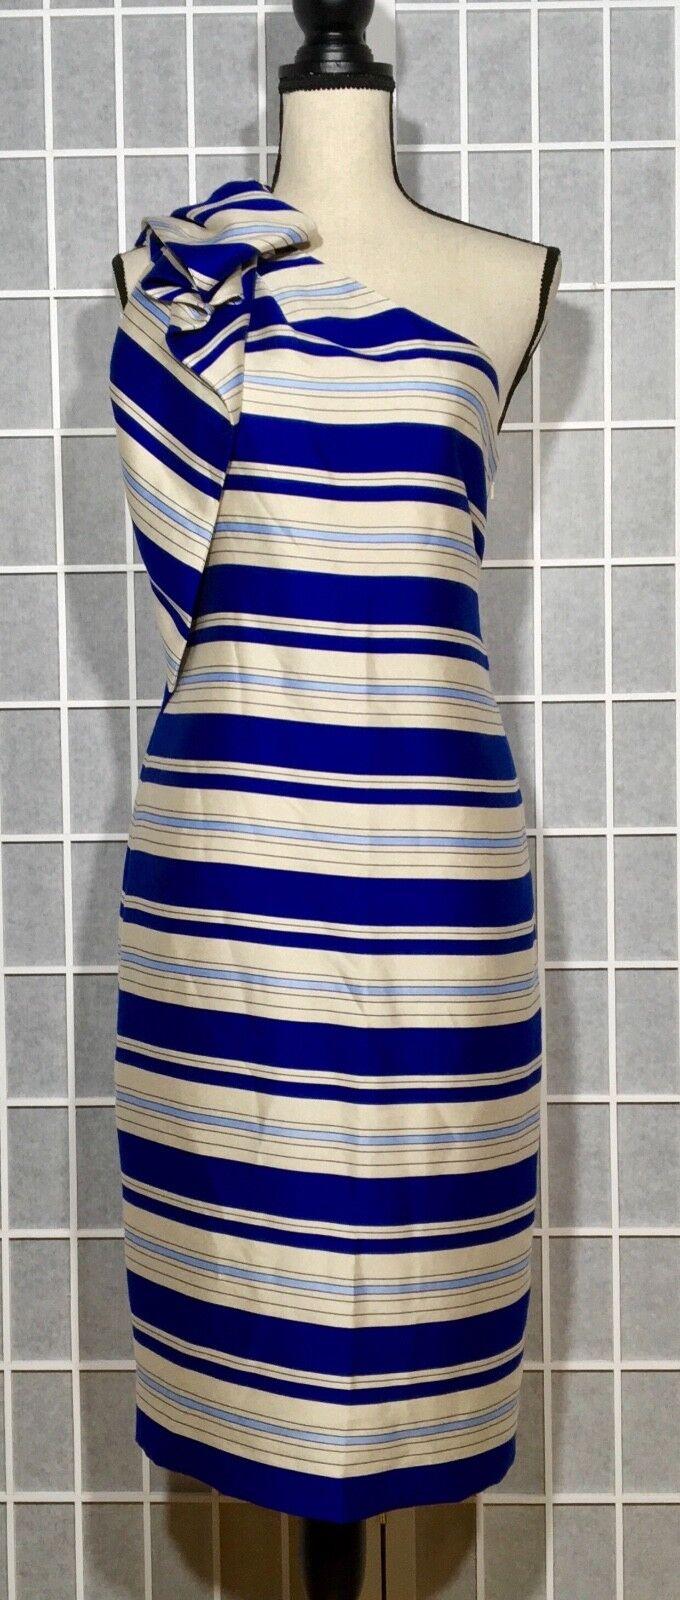 BANANA REPUBLIC WOMEN'S ONE SHOULDER DRESS NWT STRIPED SZ 6 blueE MULTI